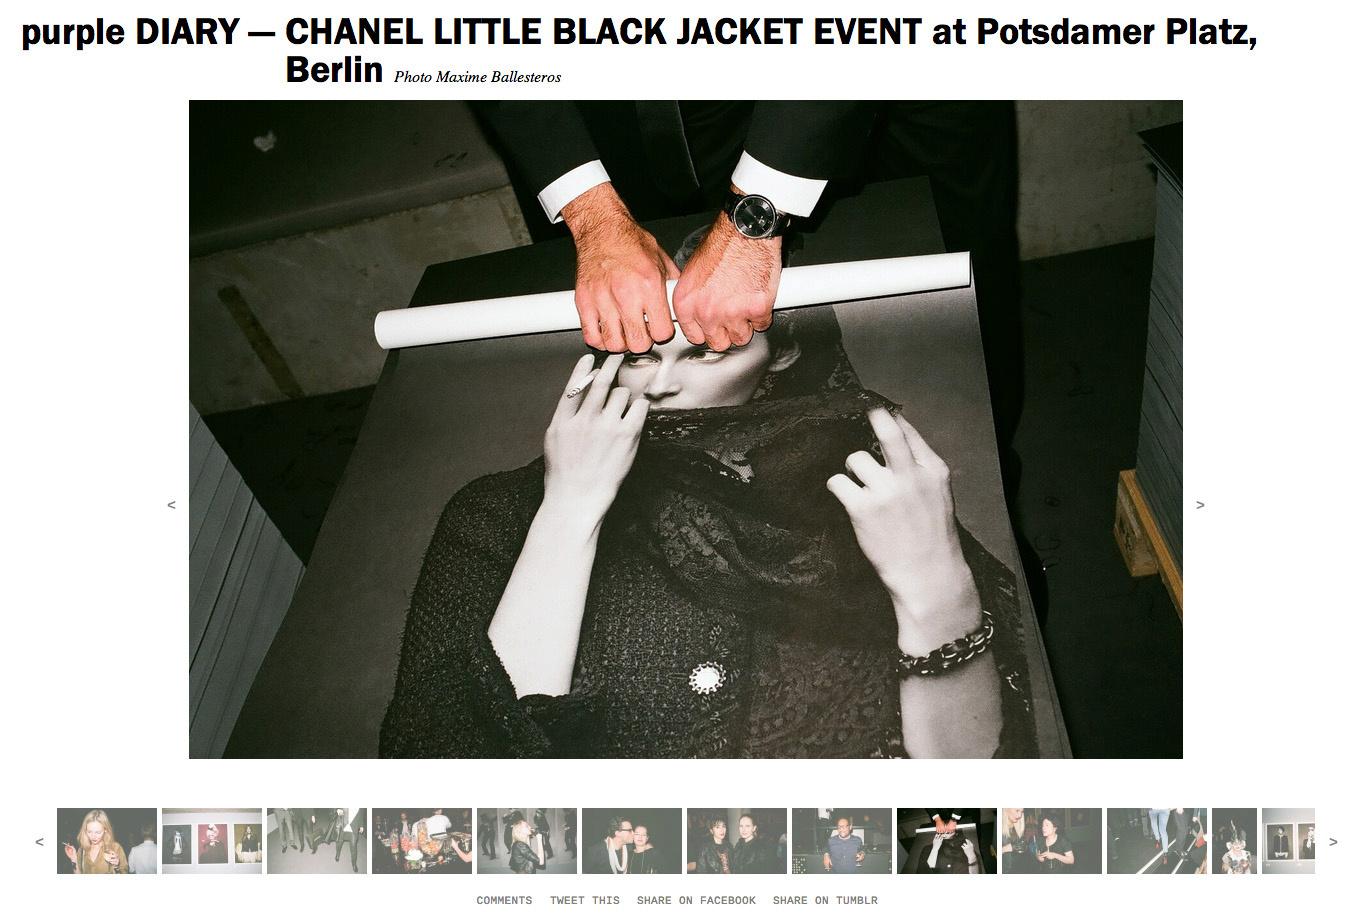 purple DIARY   CHANEL LITTLE BLACK JACKET EVENT at Potsdamer Platz  Berlin.jpg